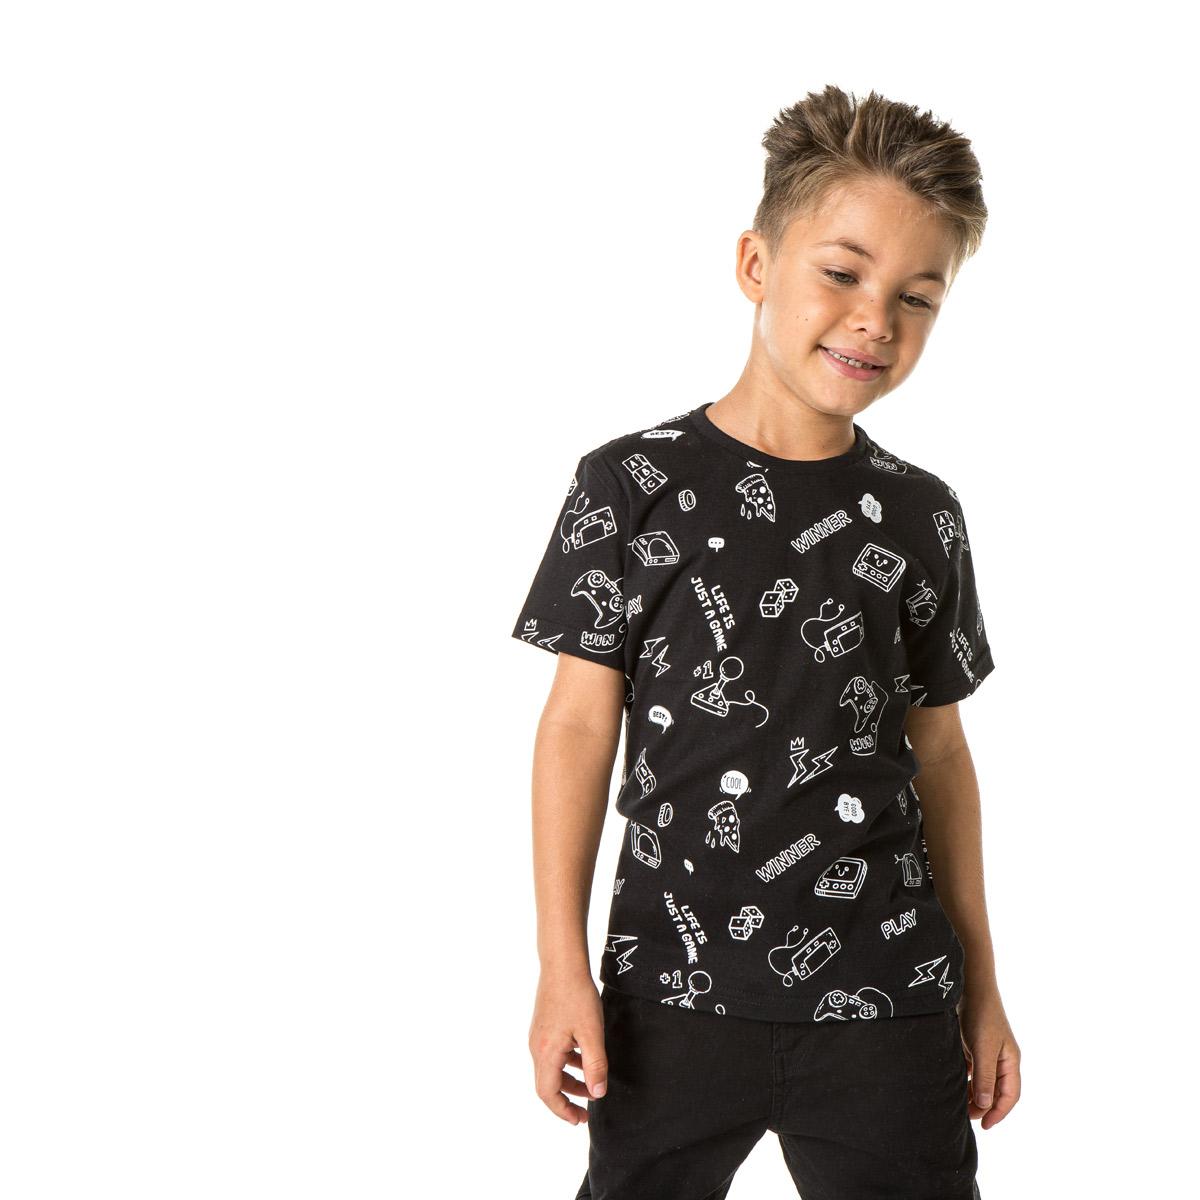 Camiseta Infantil Masculina Sba 10312